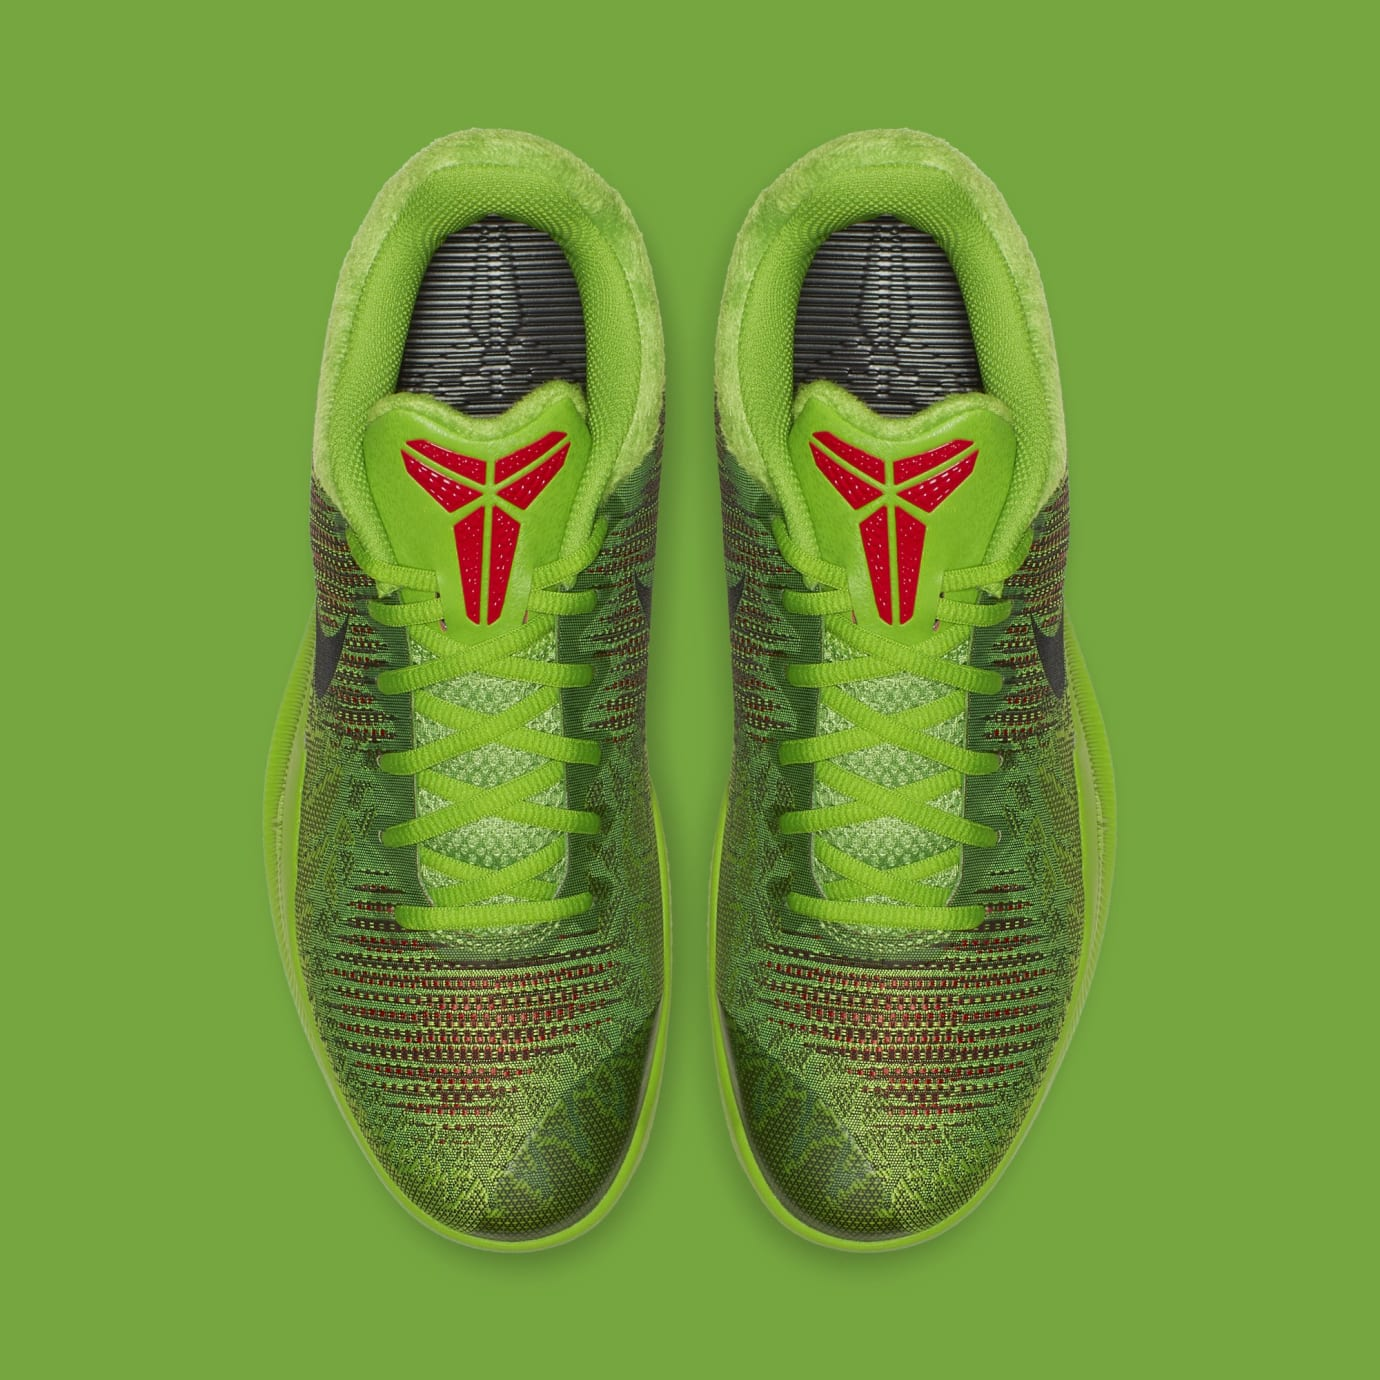 b67675c20fc12a Image via Nike Nike Mamba Rage EP  Electric Green  908974-300 (Top)